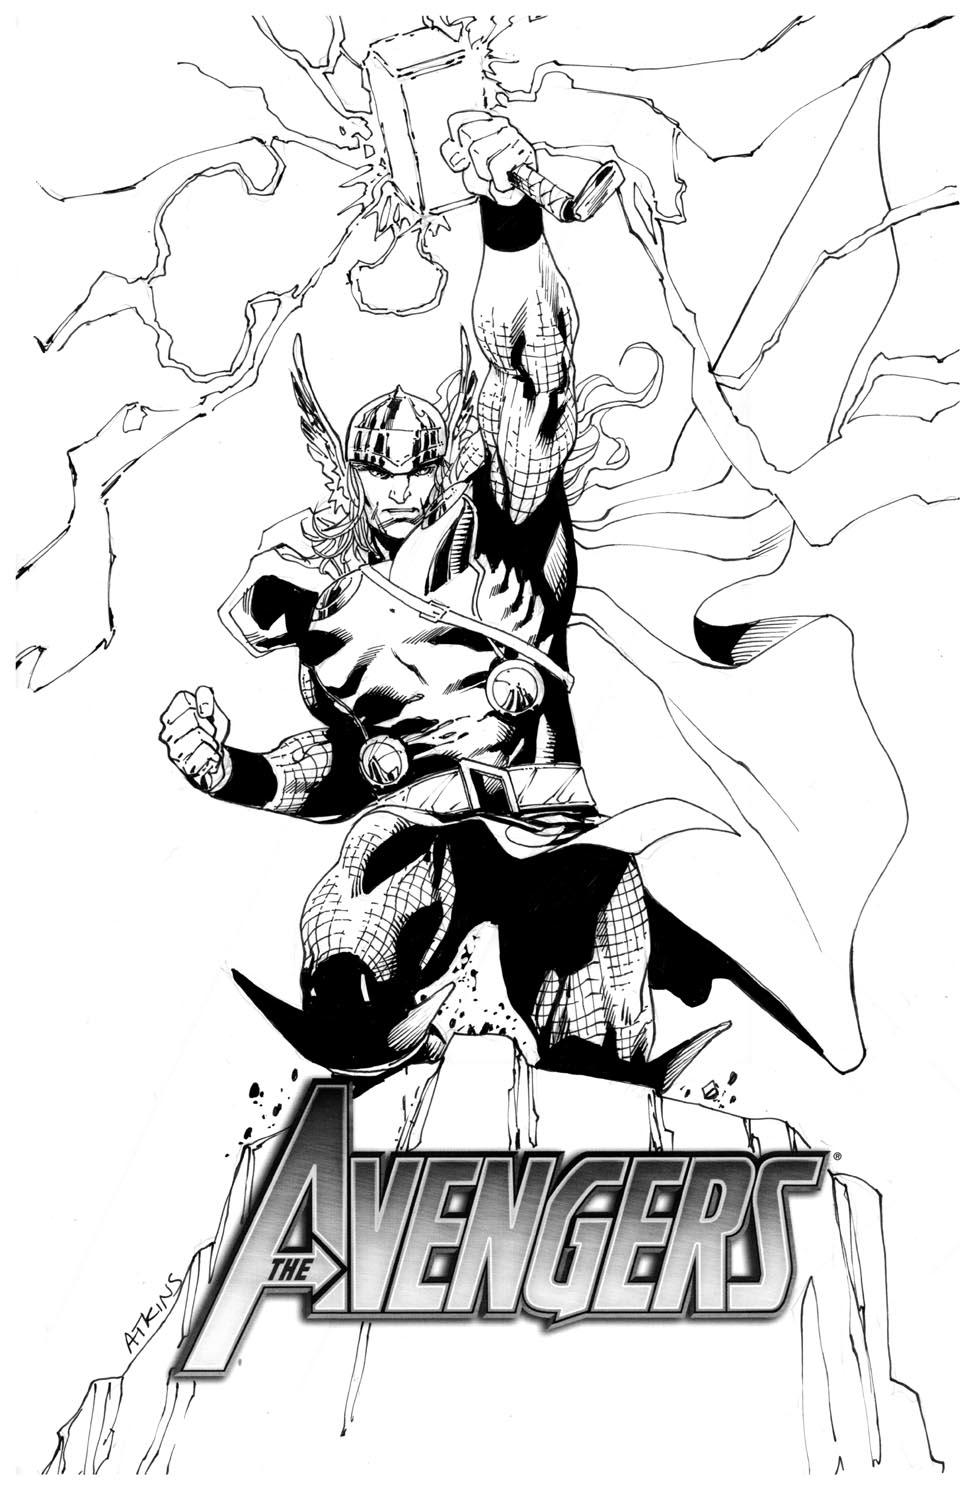 Drawn thor Drawing Spiderman Art Avengers April Thor April